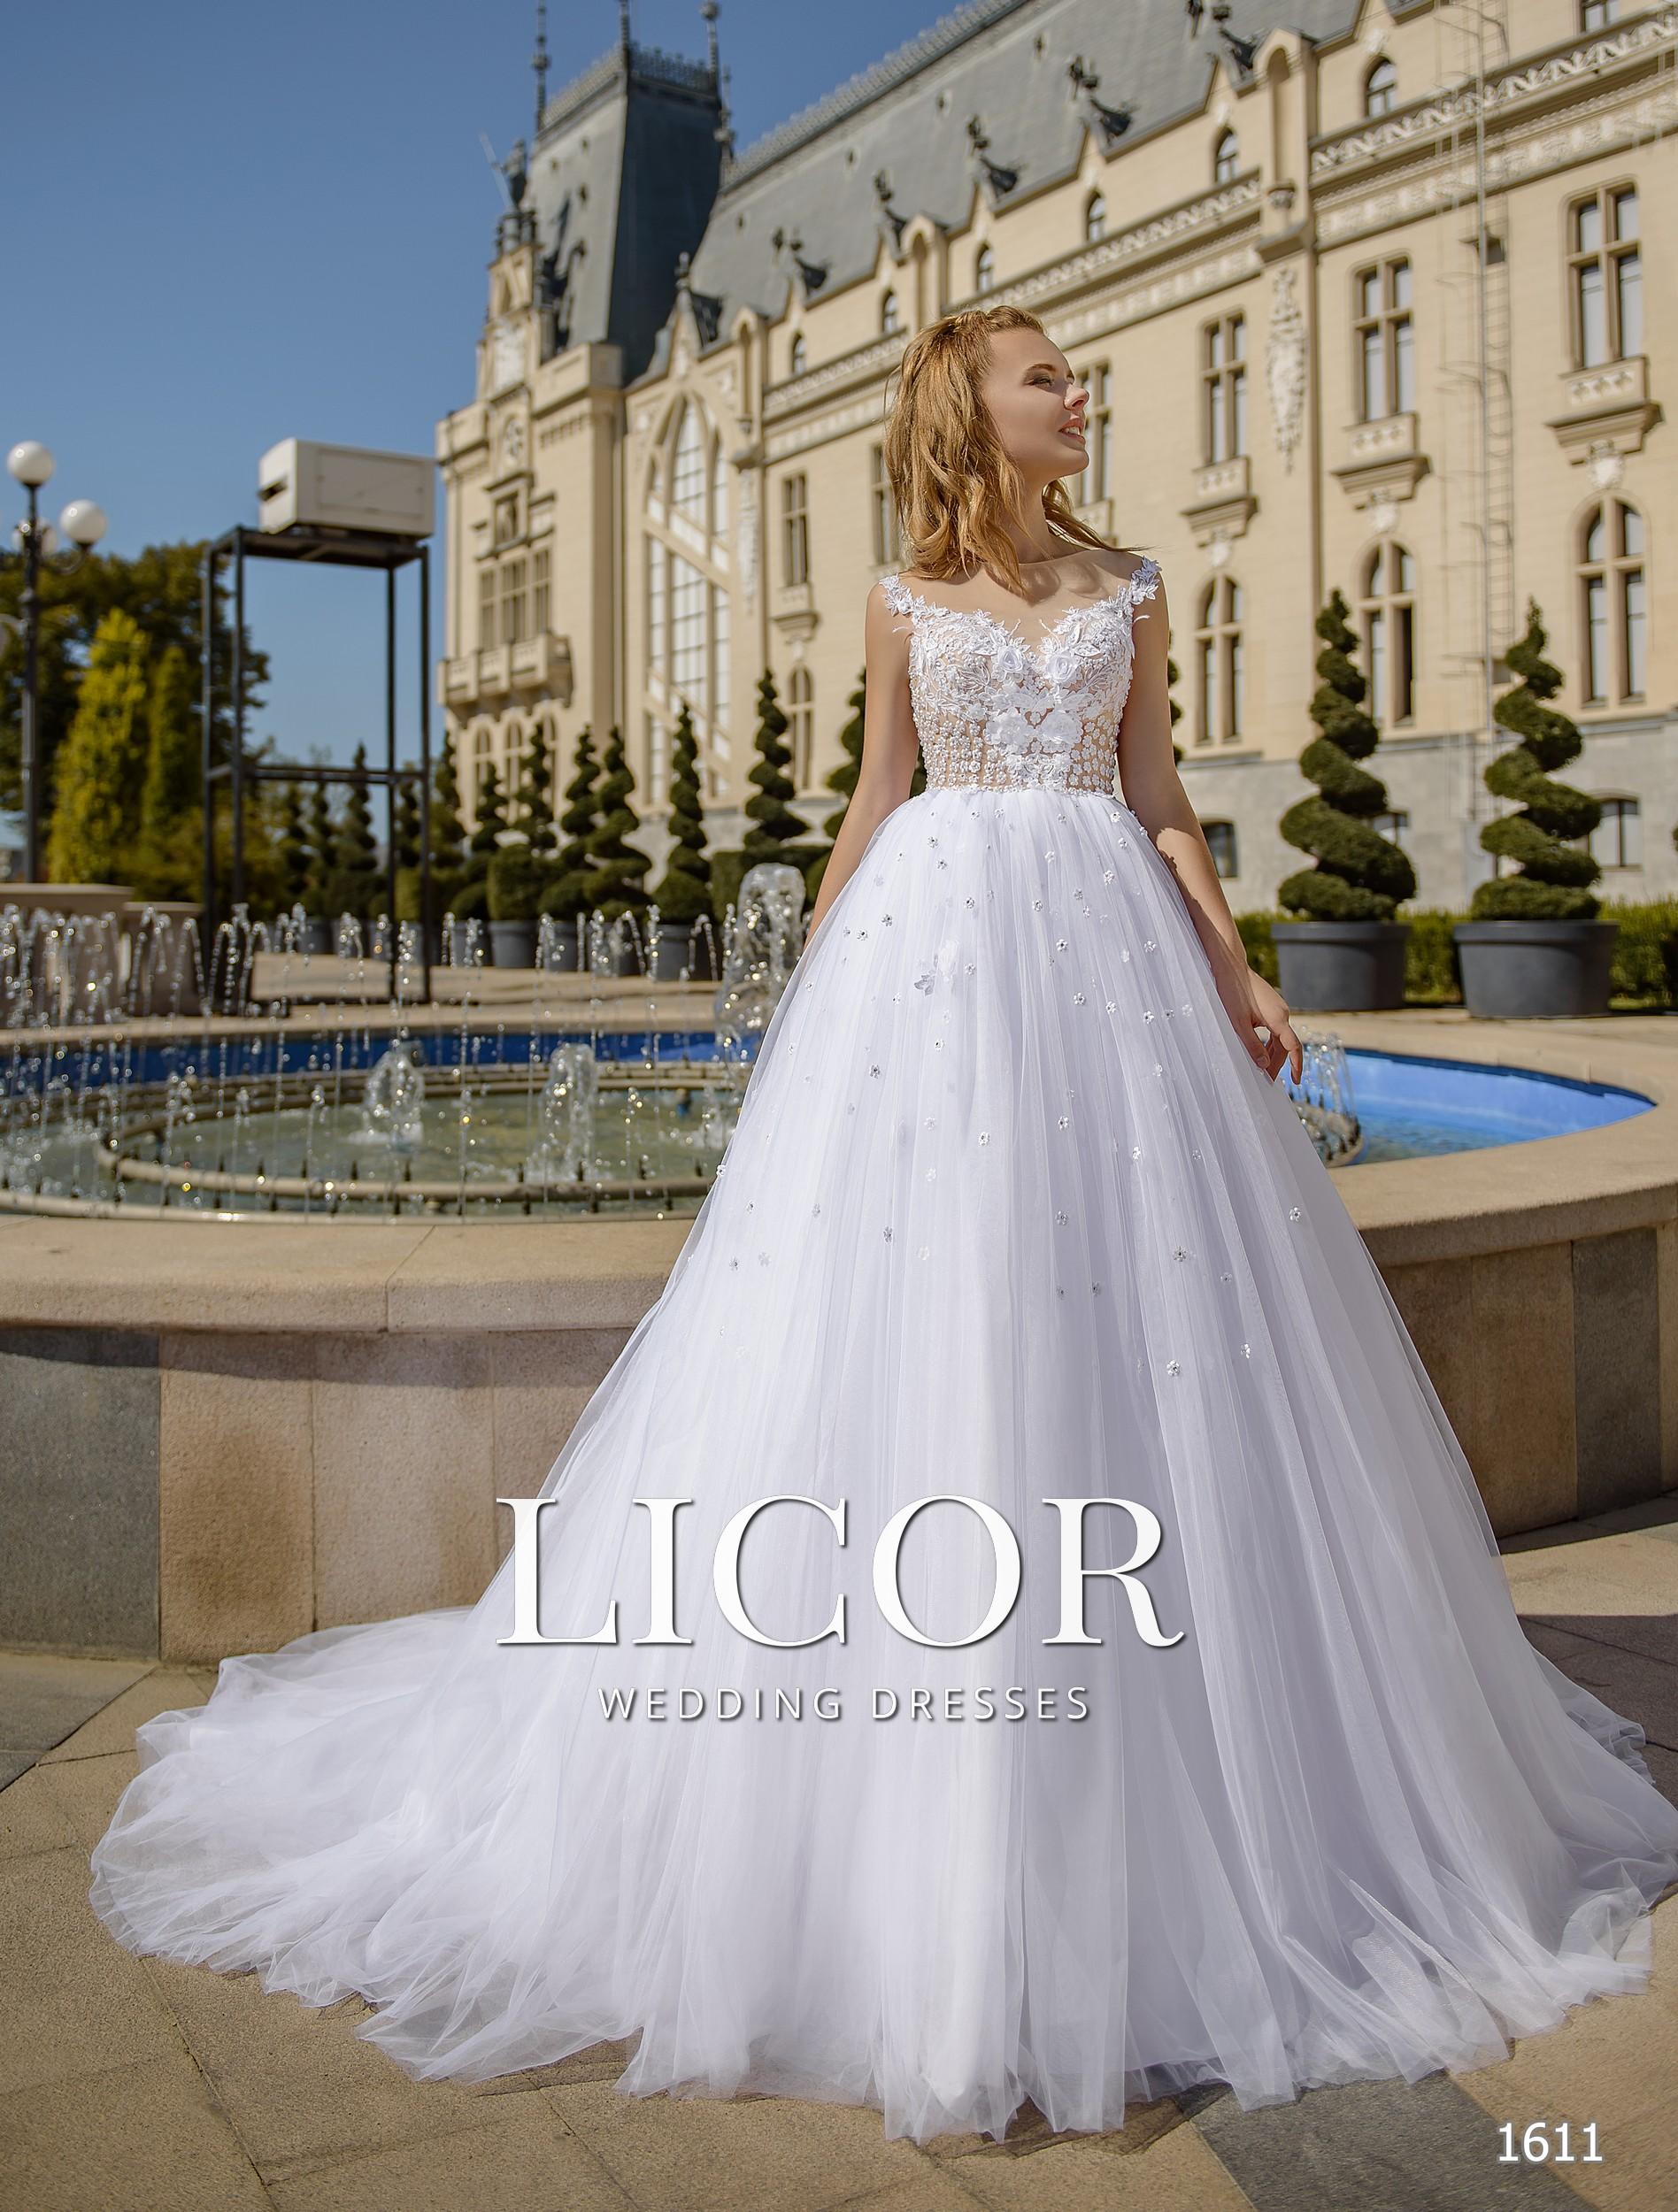 http://licor.com.ua/images/stories/virtuemart/product/1611(1).jpg